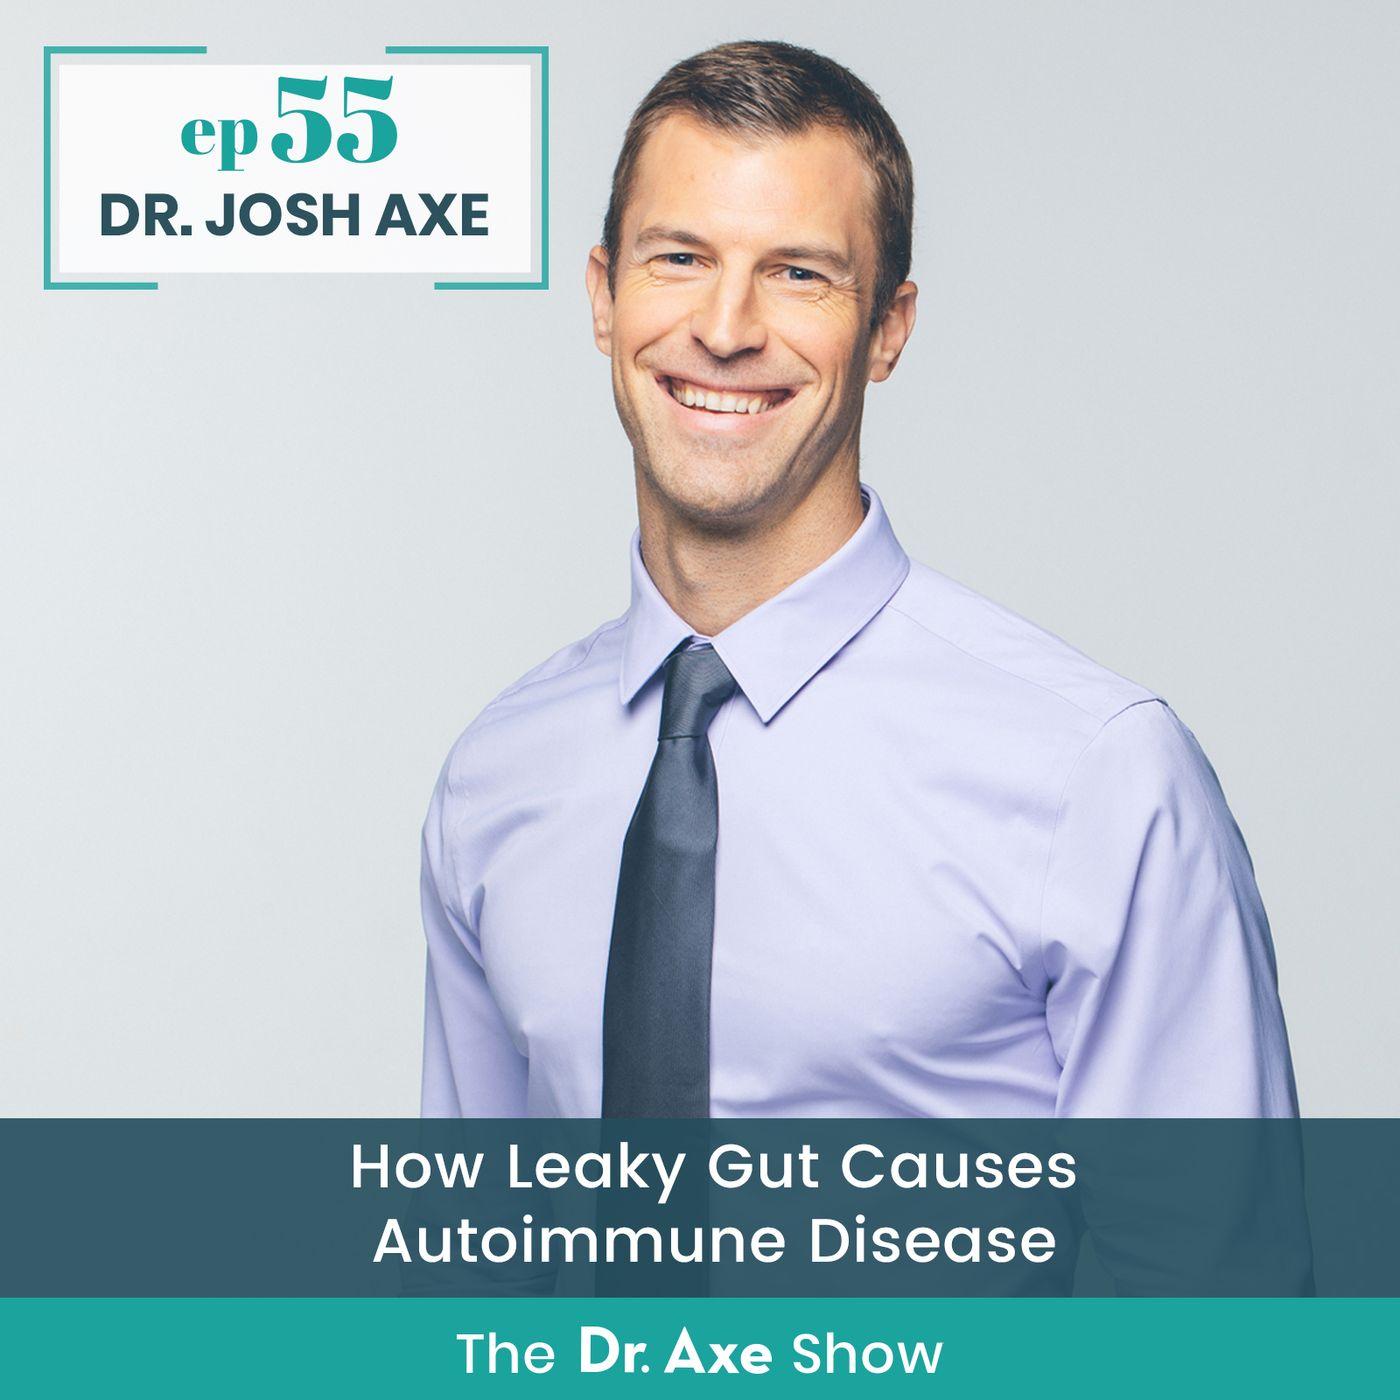 How Leaky Gut Causes Autoimmune Disease